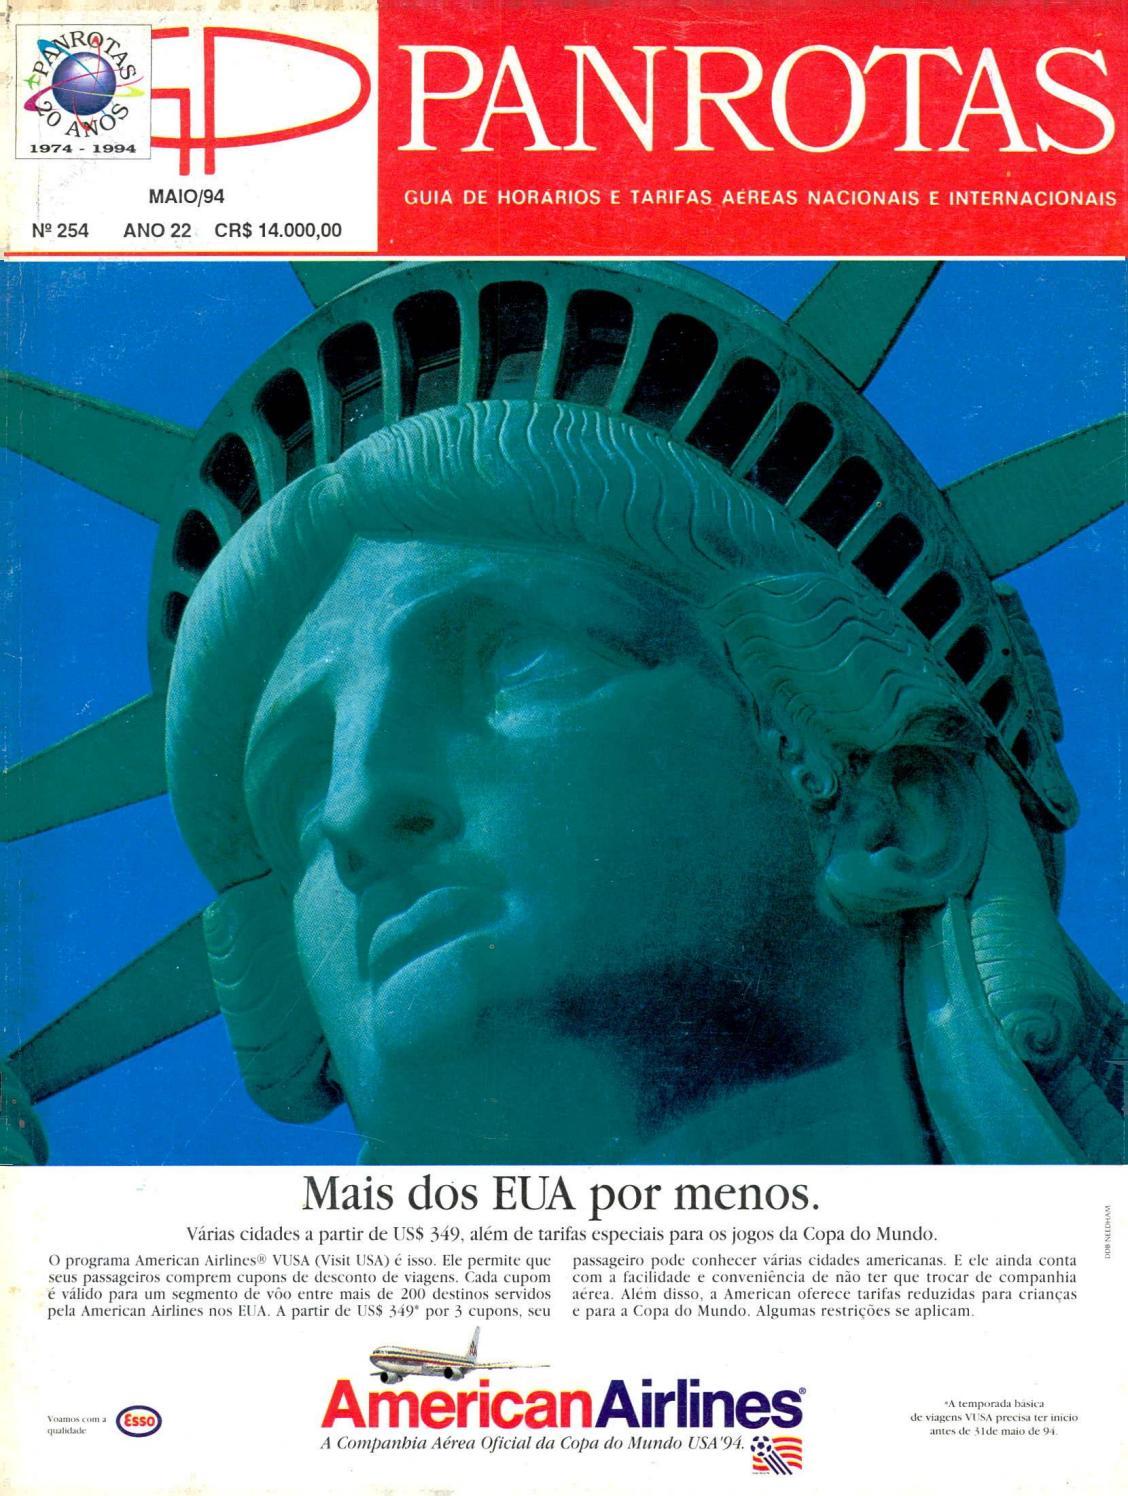 1890b76b7f Guia PANROTAS - Edição 254 - Maio 1994 by PANROTAS Editora - issuu